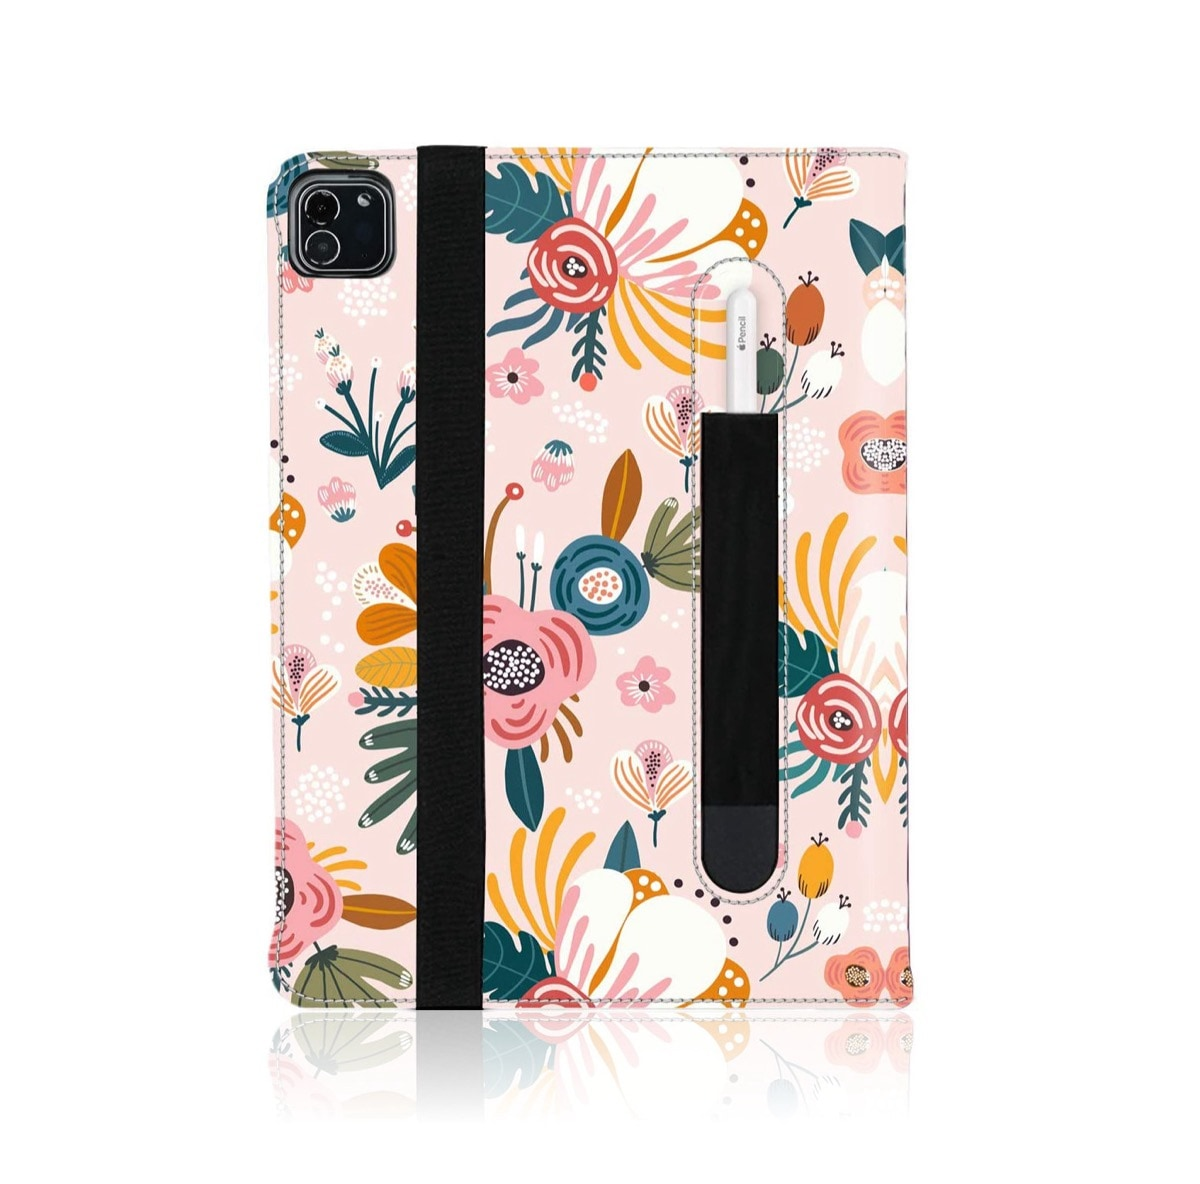 Floral iPad Pro 11 folio stand case cover